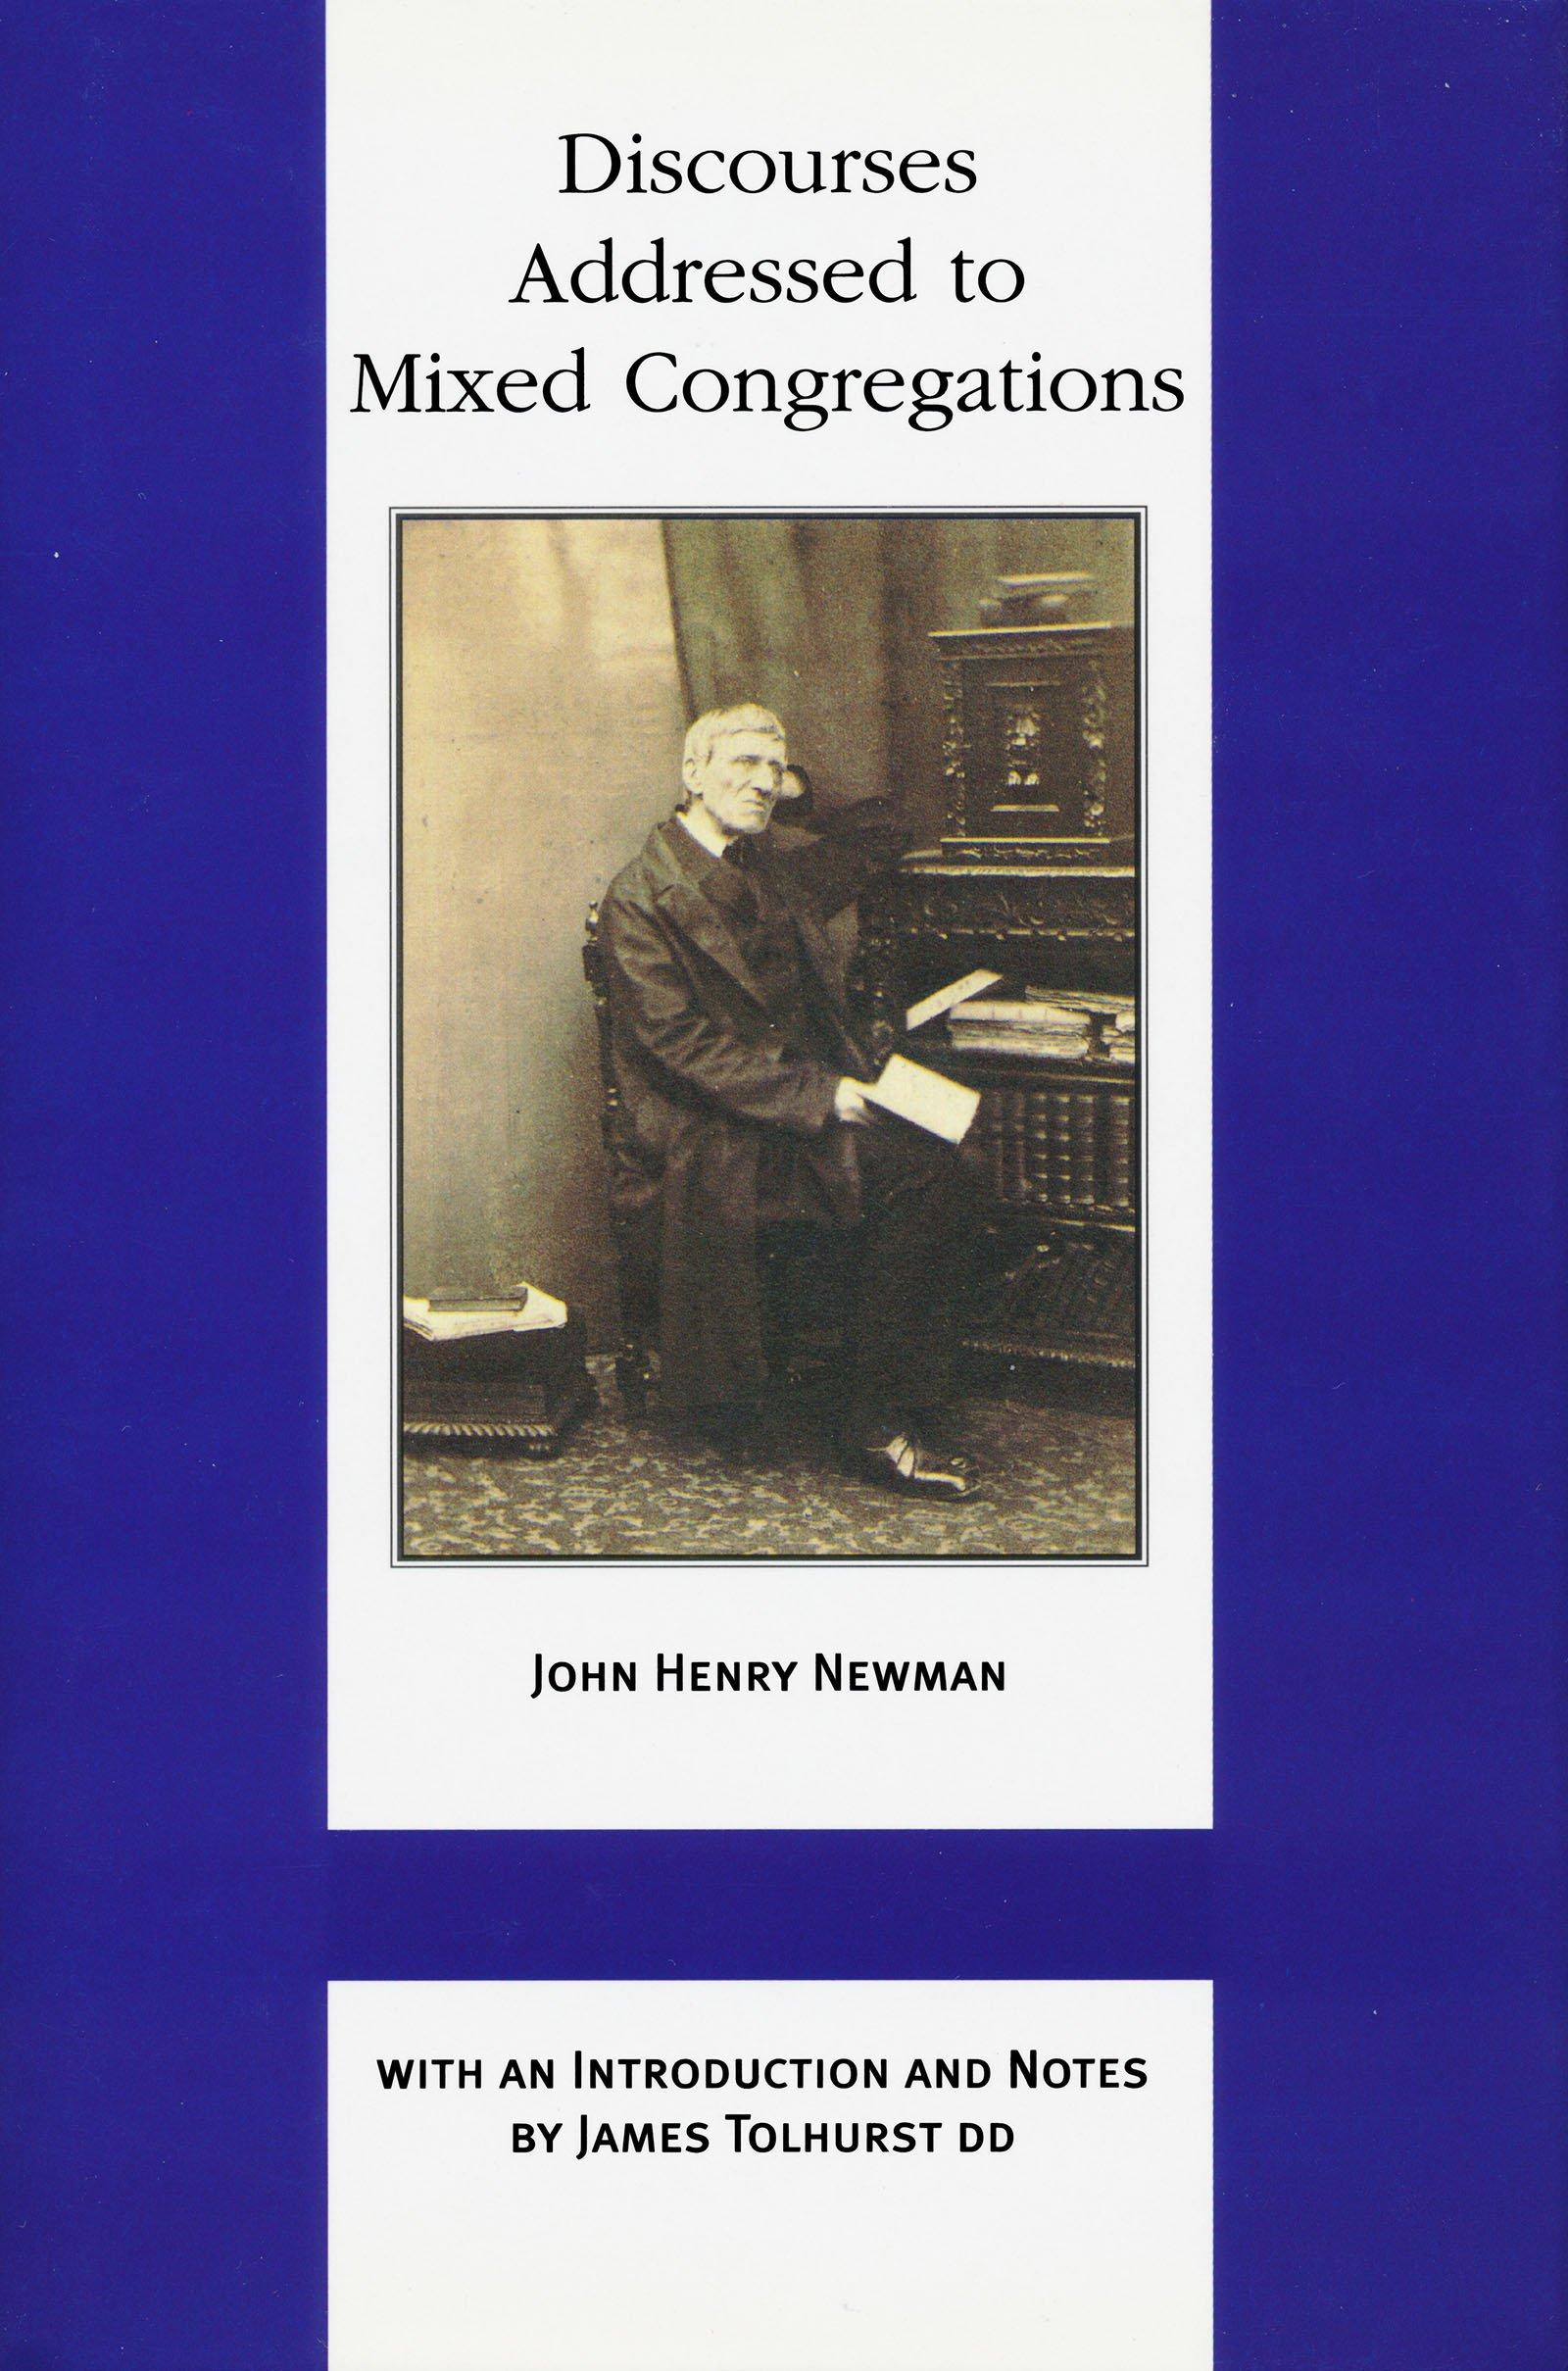 Discourses Addressed to Mixed Congregations (Works of Cardinal Newman: Birmingham Oratory Millennium Edition) pdf epub